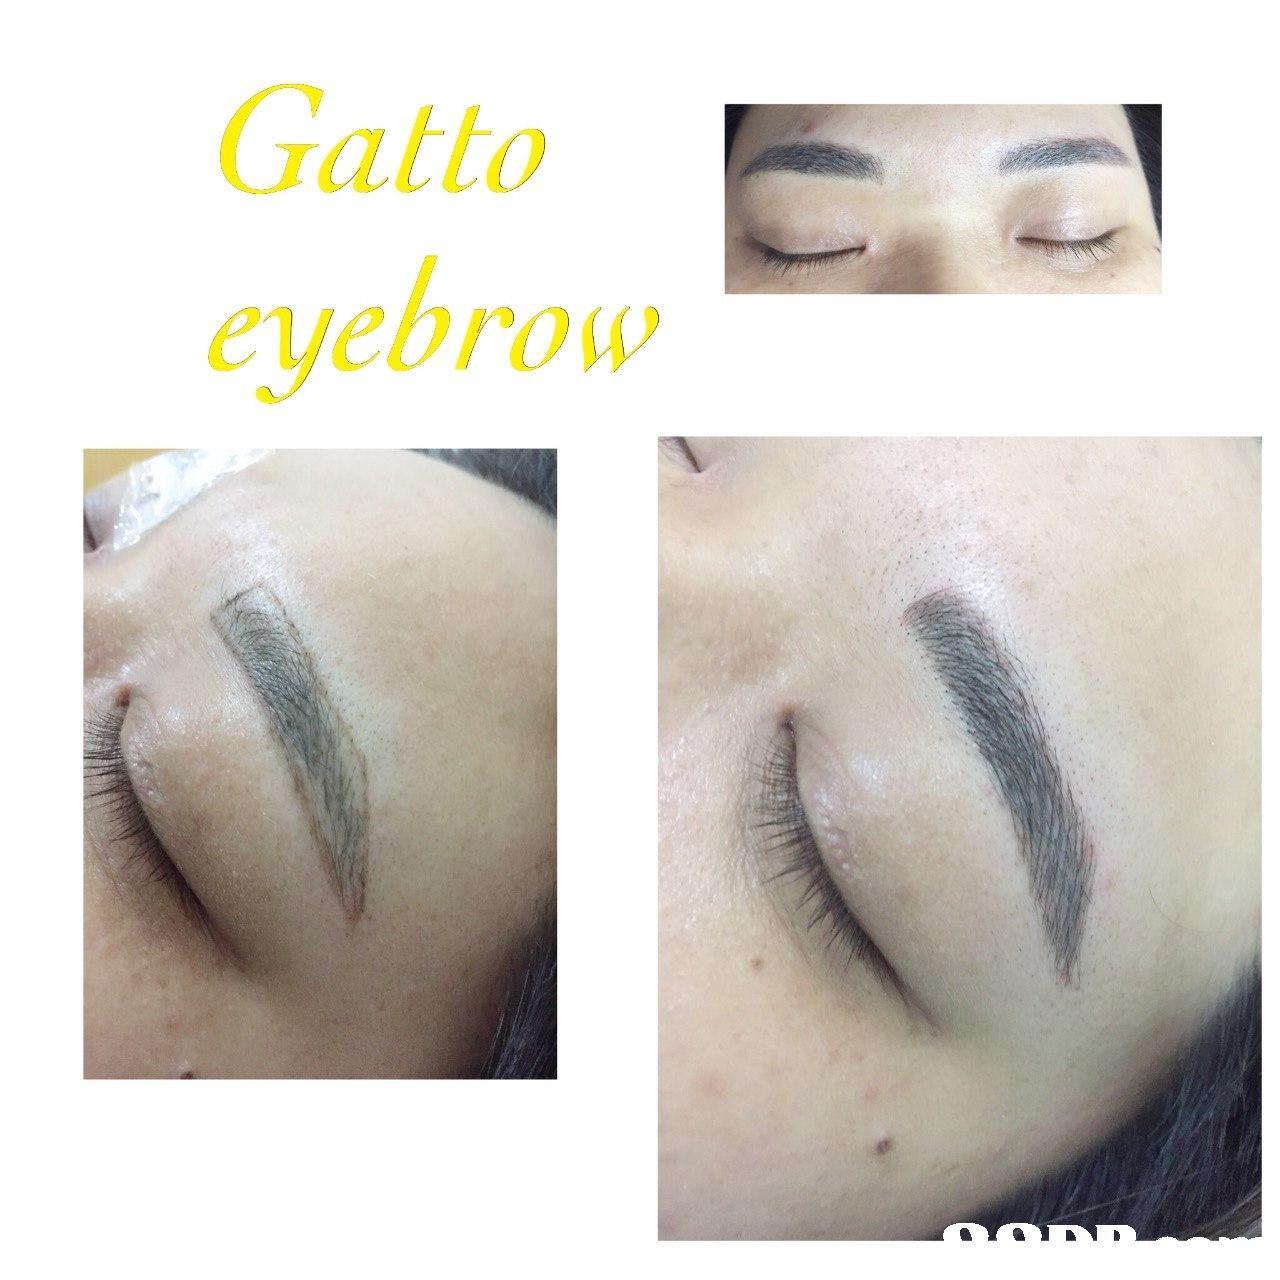 Gatto eyebrow  eyebrow,nose,eye,eyelash,eye shadow